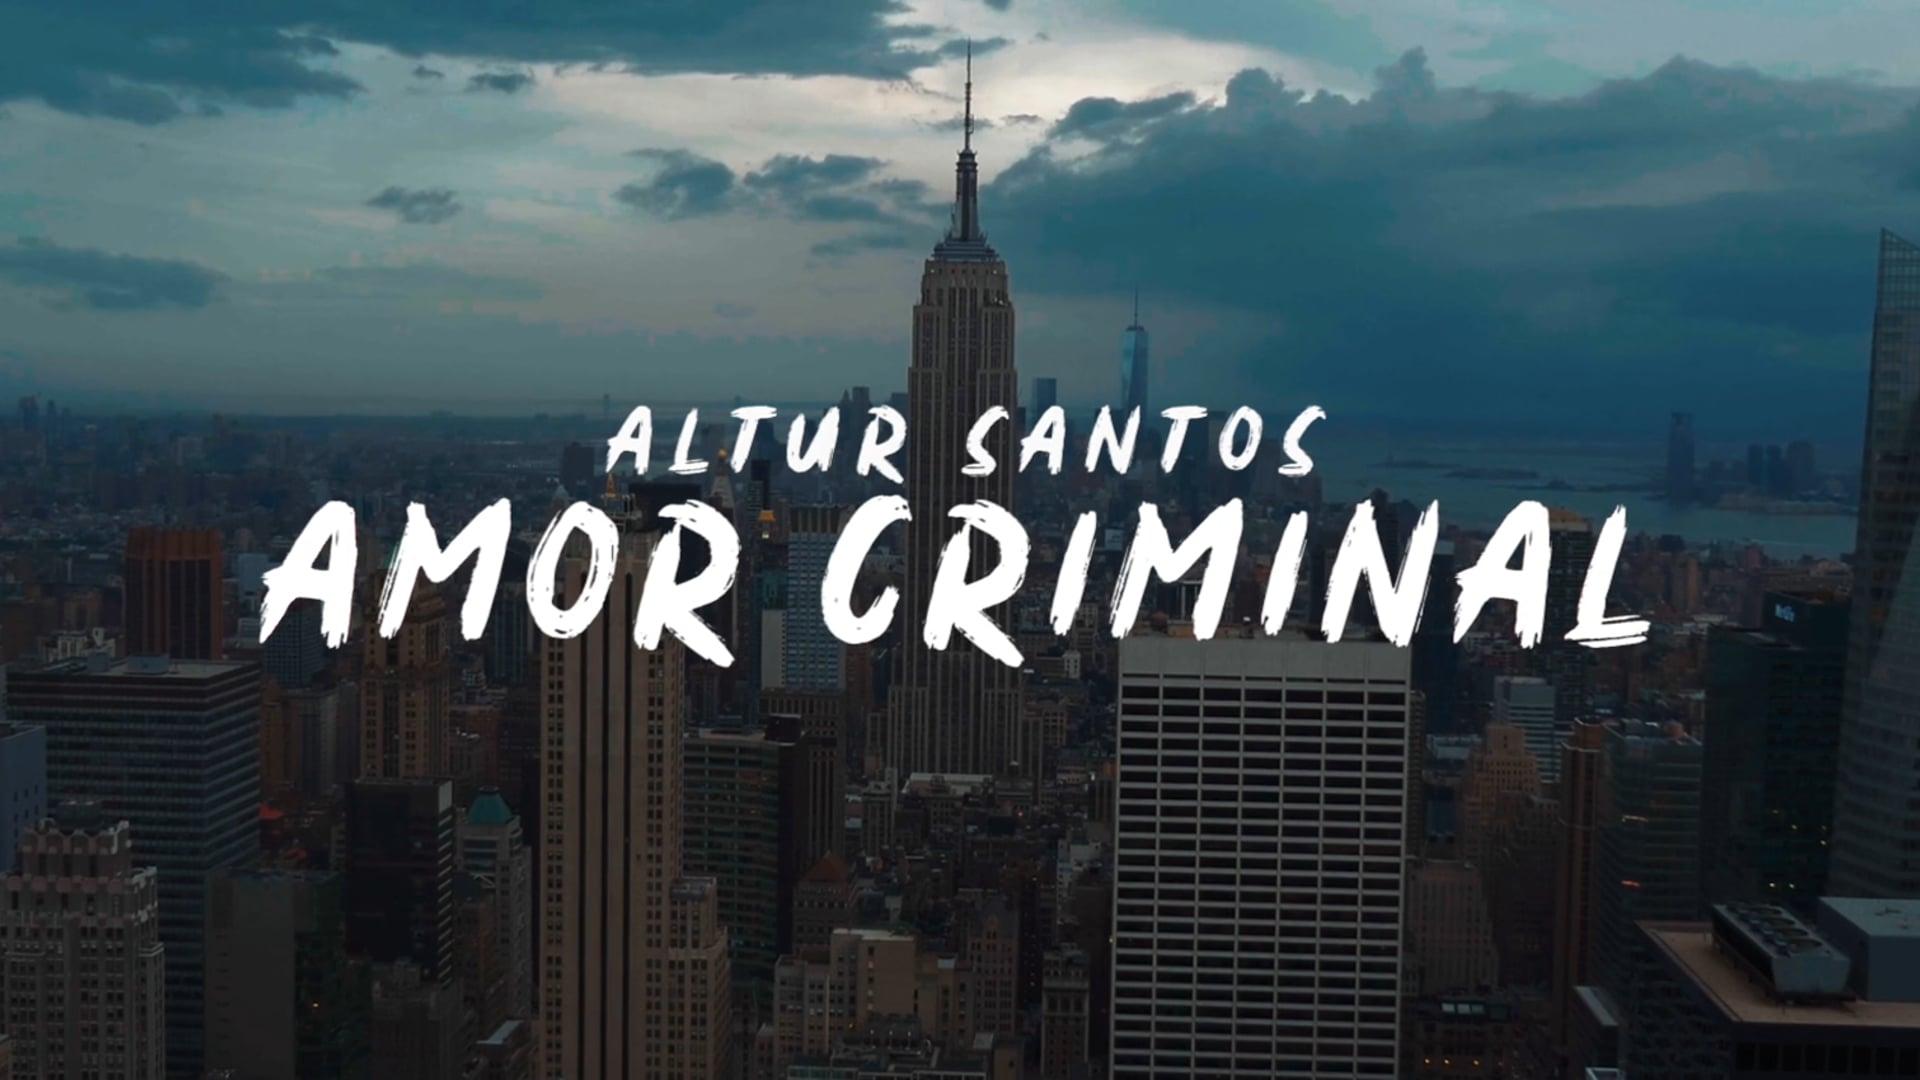 Altur Santos - Amor Criminal (Music Video)